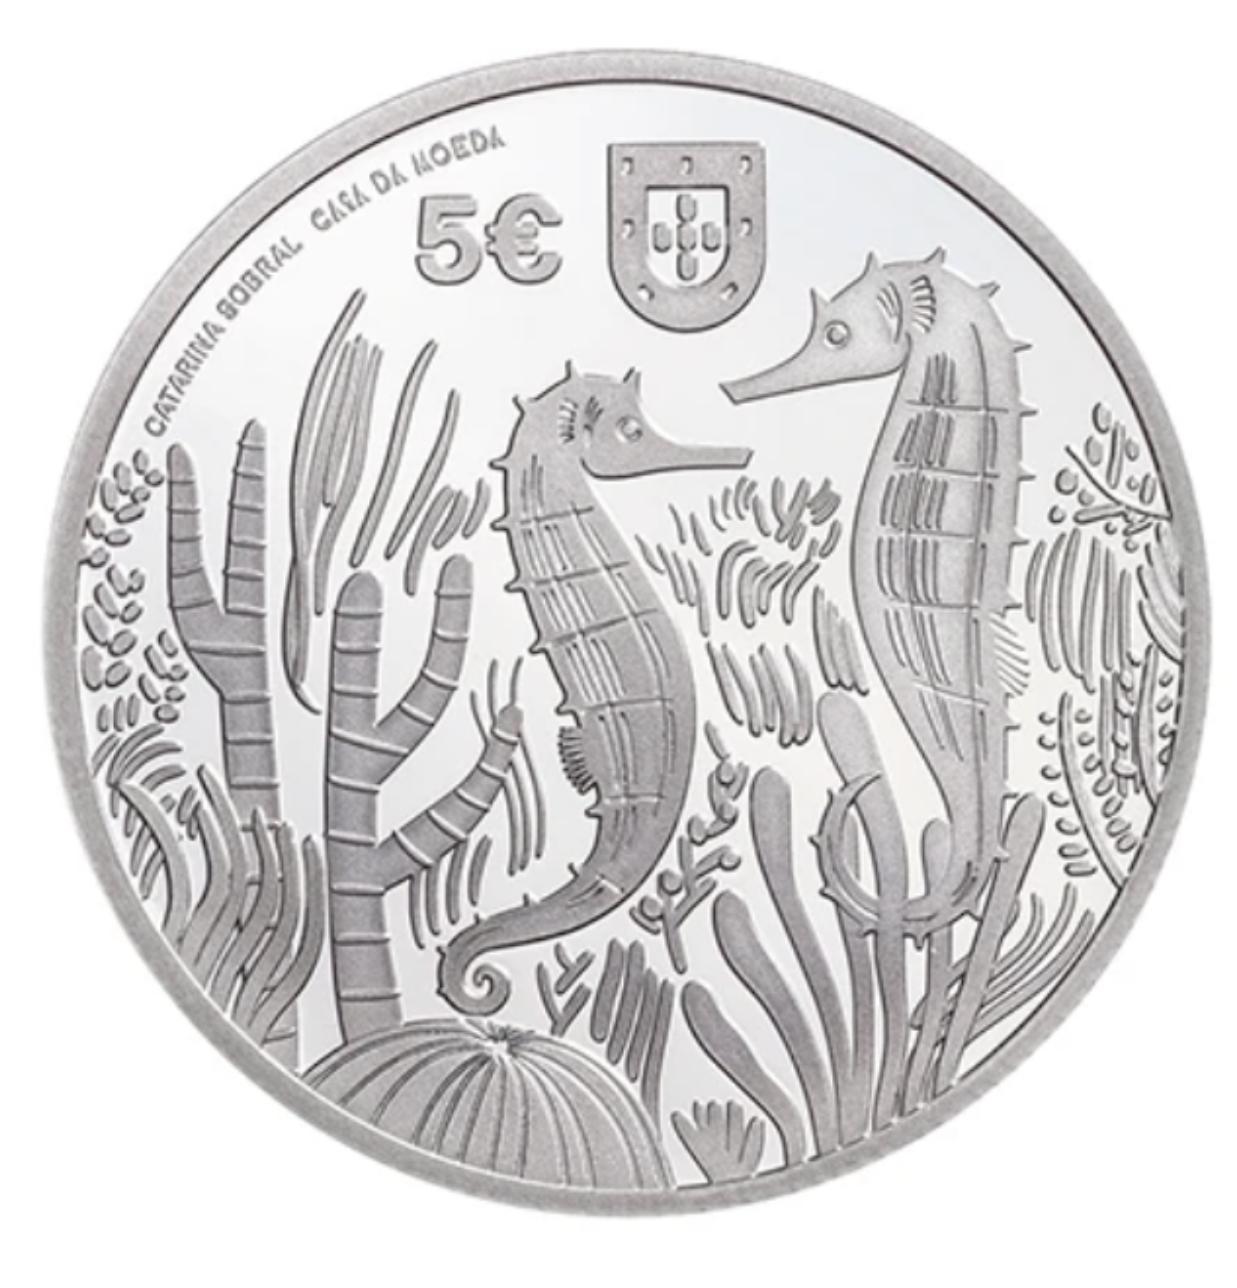 Portugal 5€ Cavalo Marinho Prata Proof